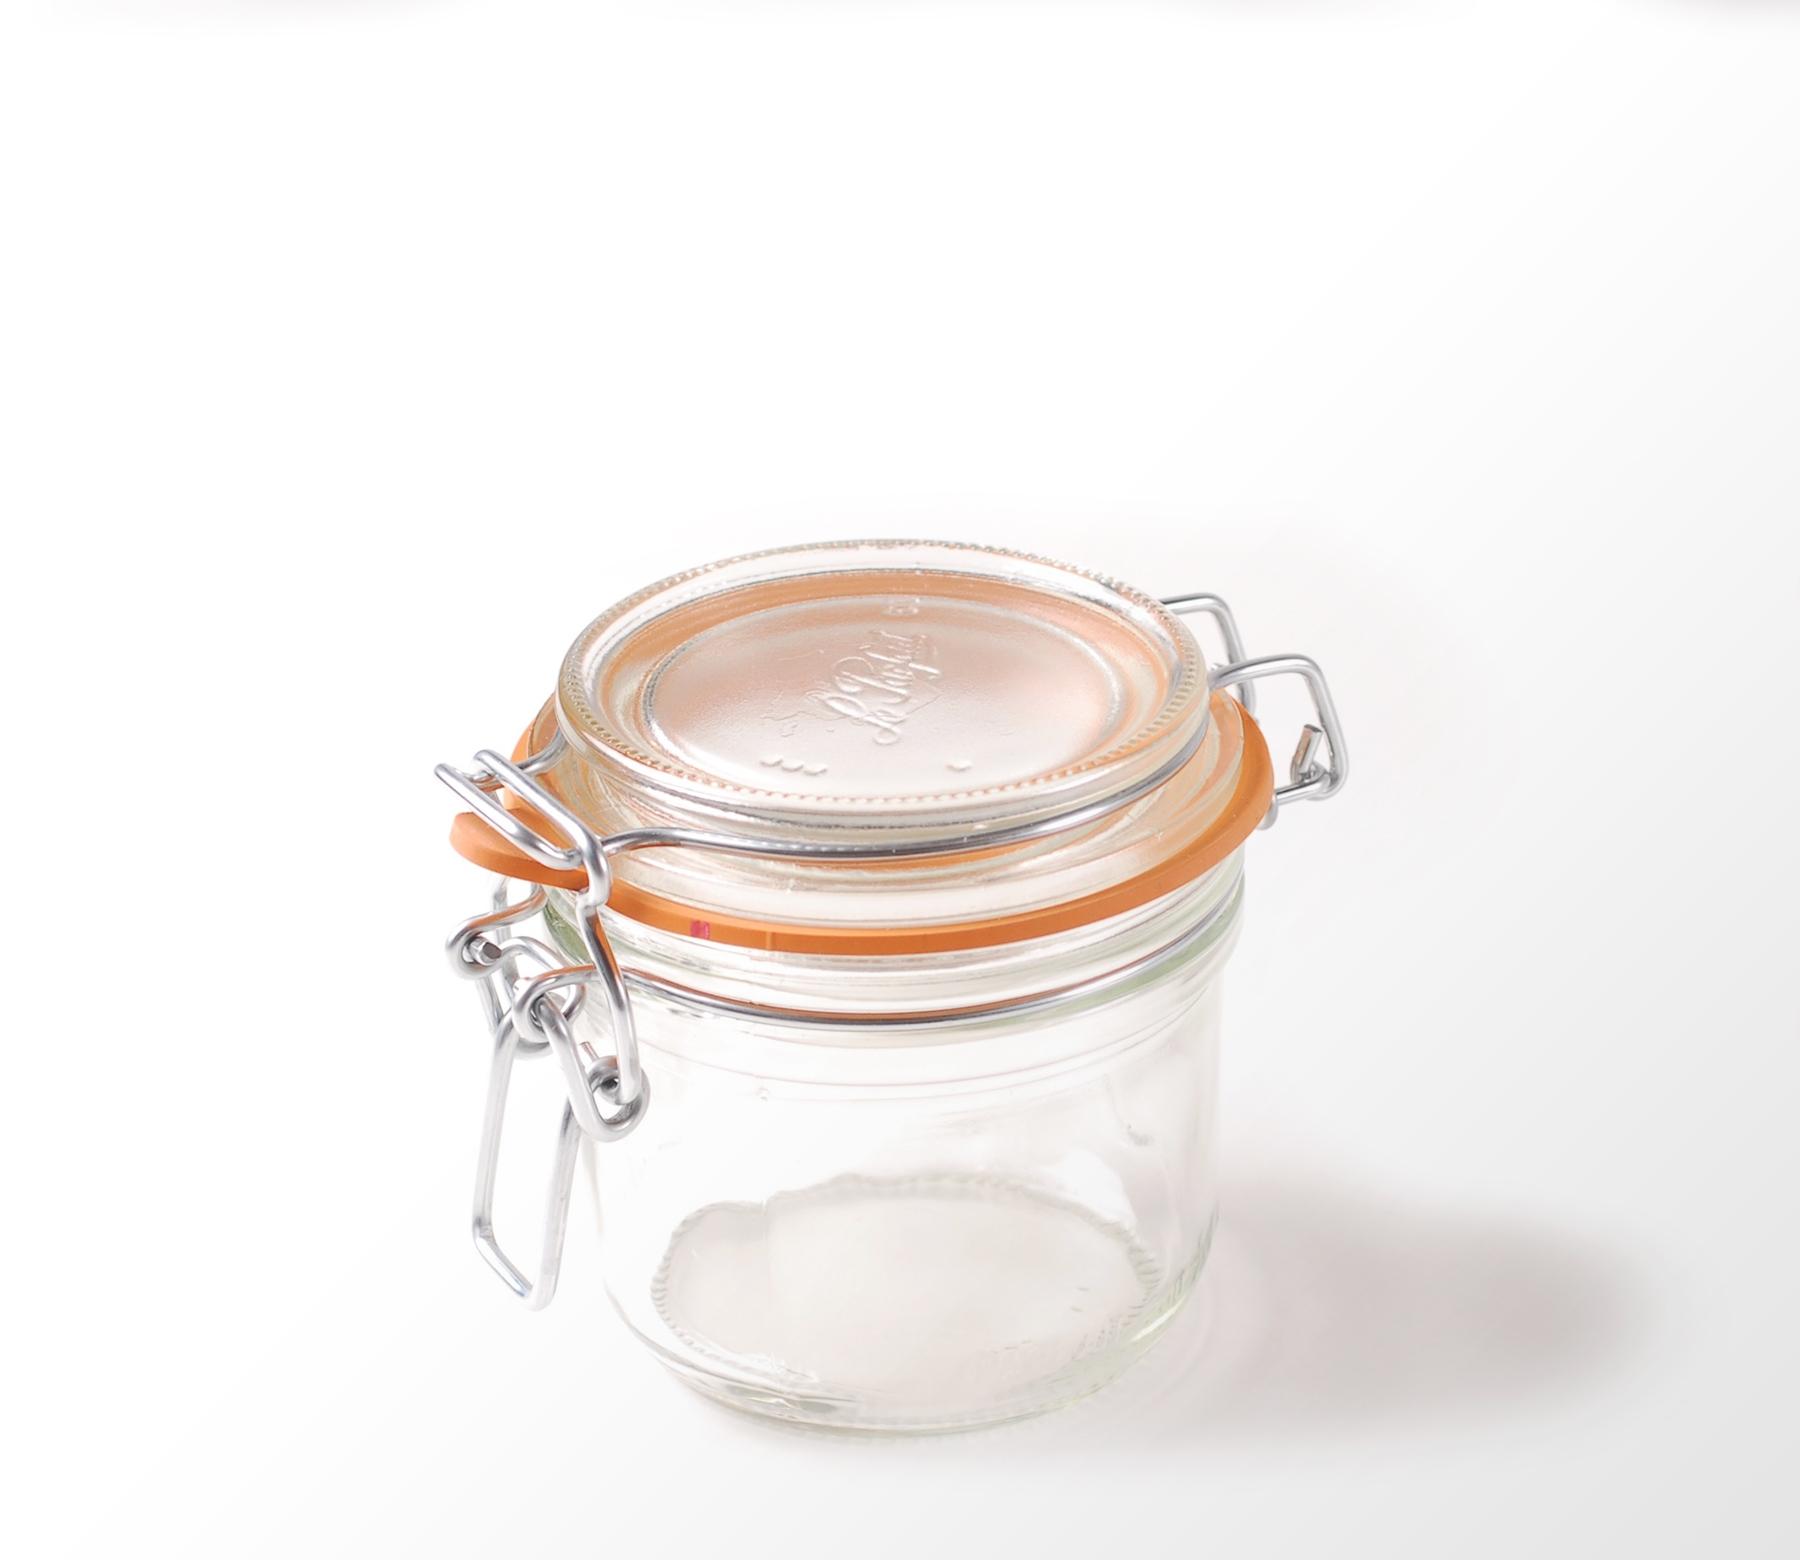 Tarros de vidrio tarro de vidrio con tapa decoracin con - Tarro cristal con tapa ...